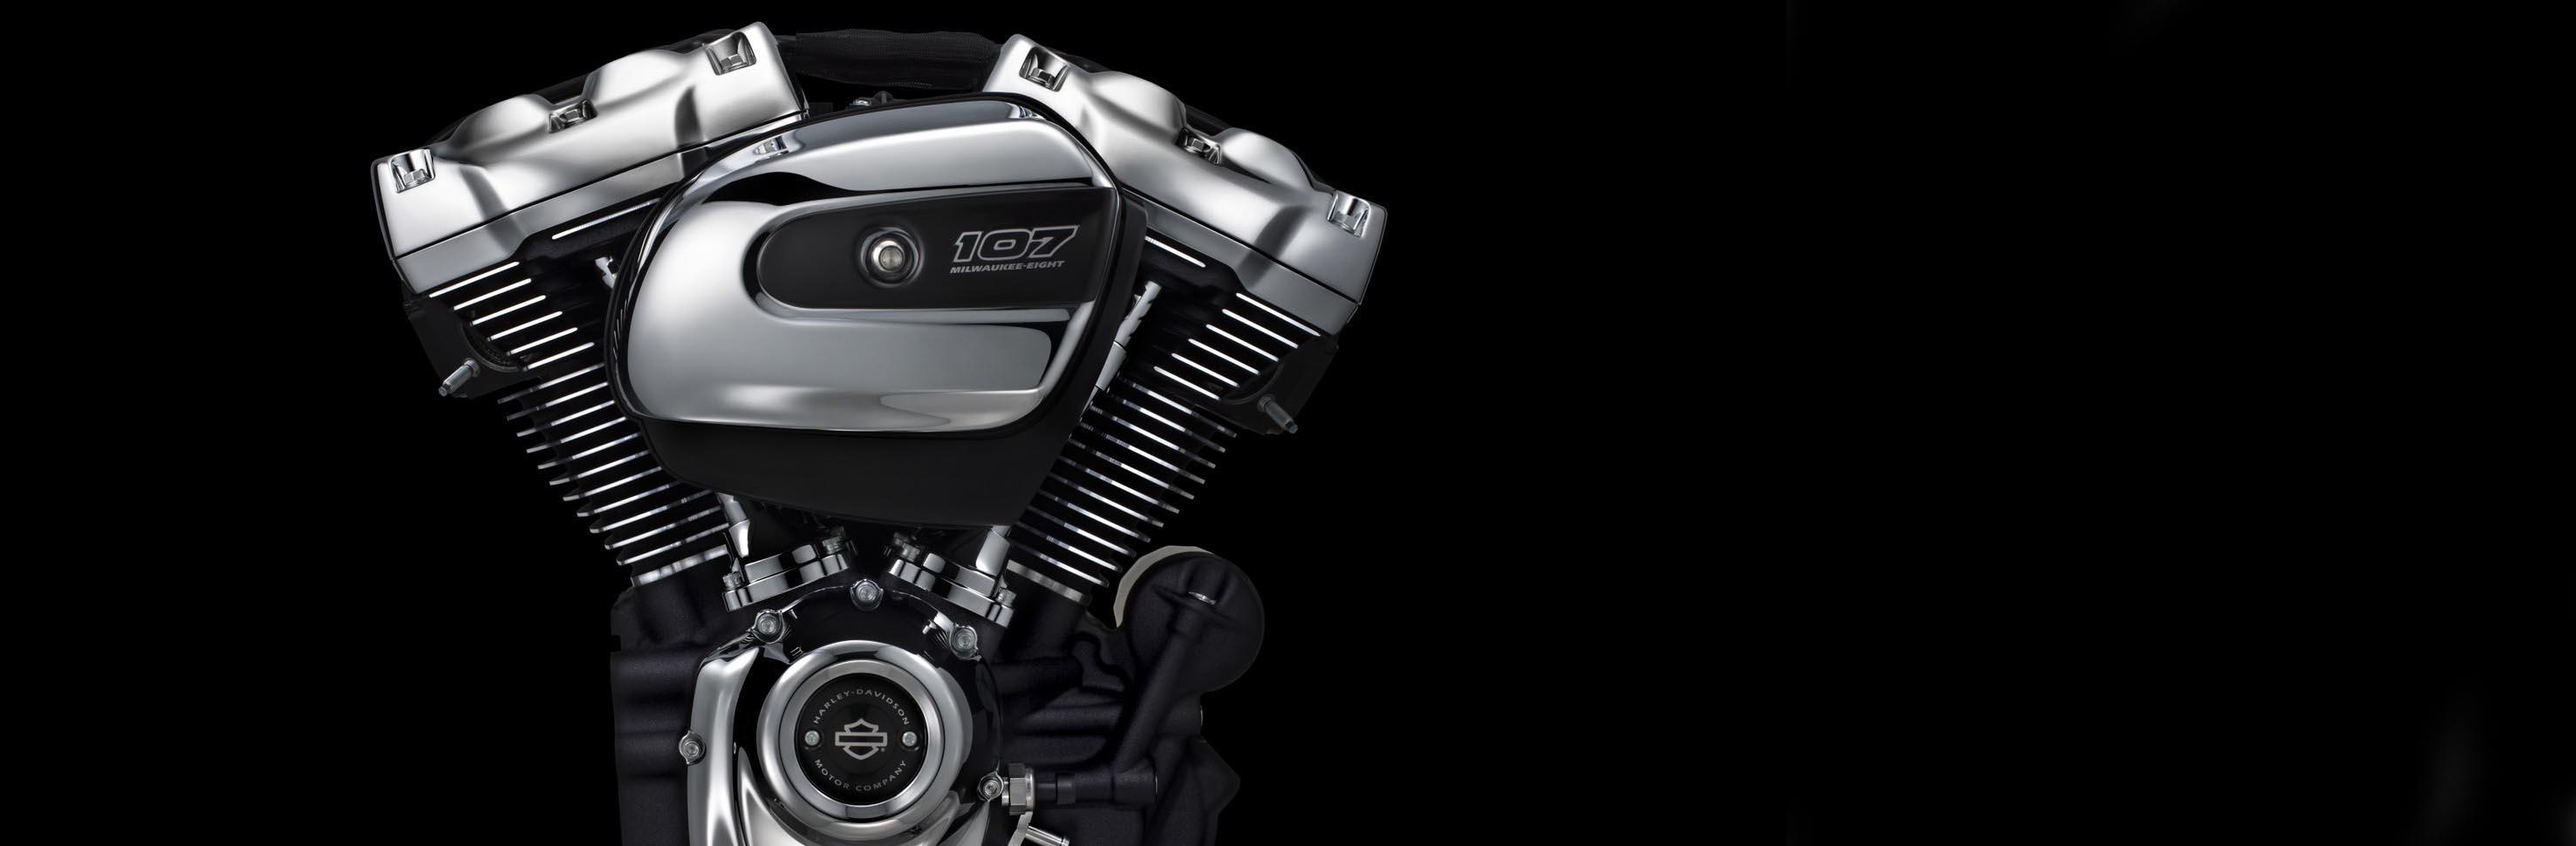 El nuevo motor de Harley-Davidson, LA JOYA DE LA CORONA